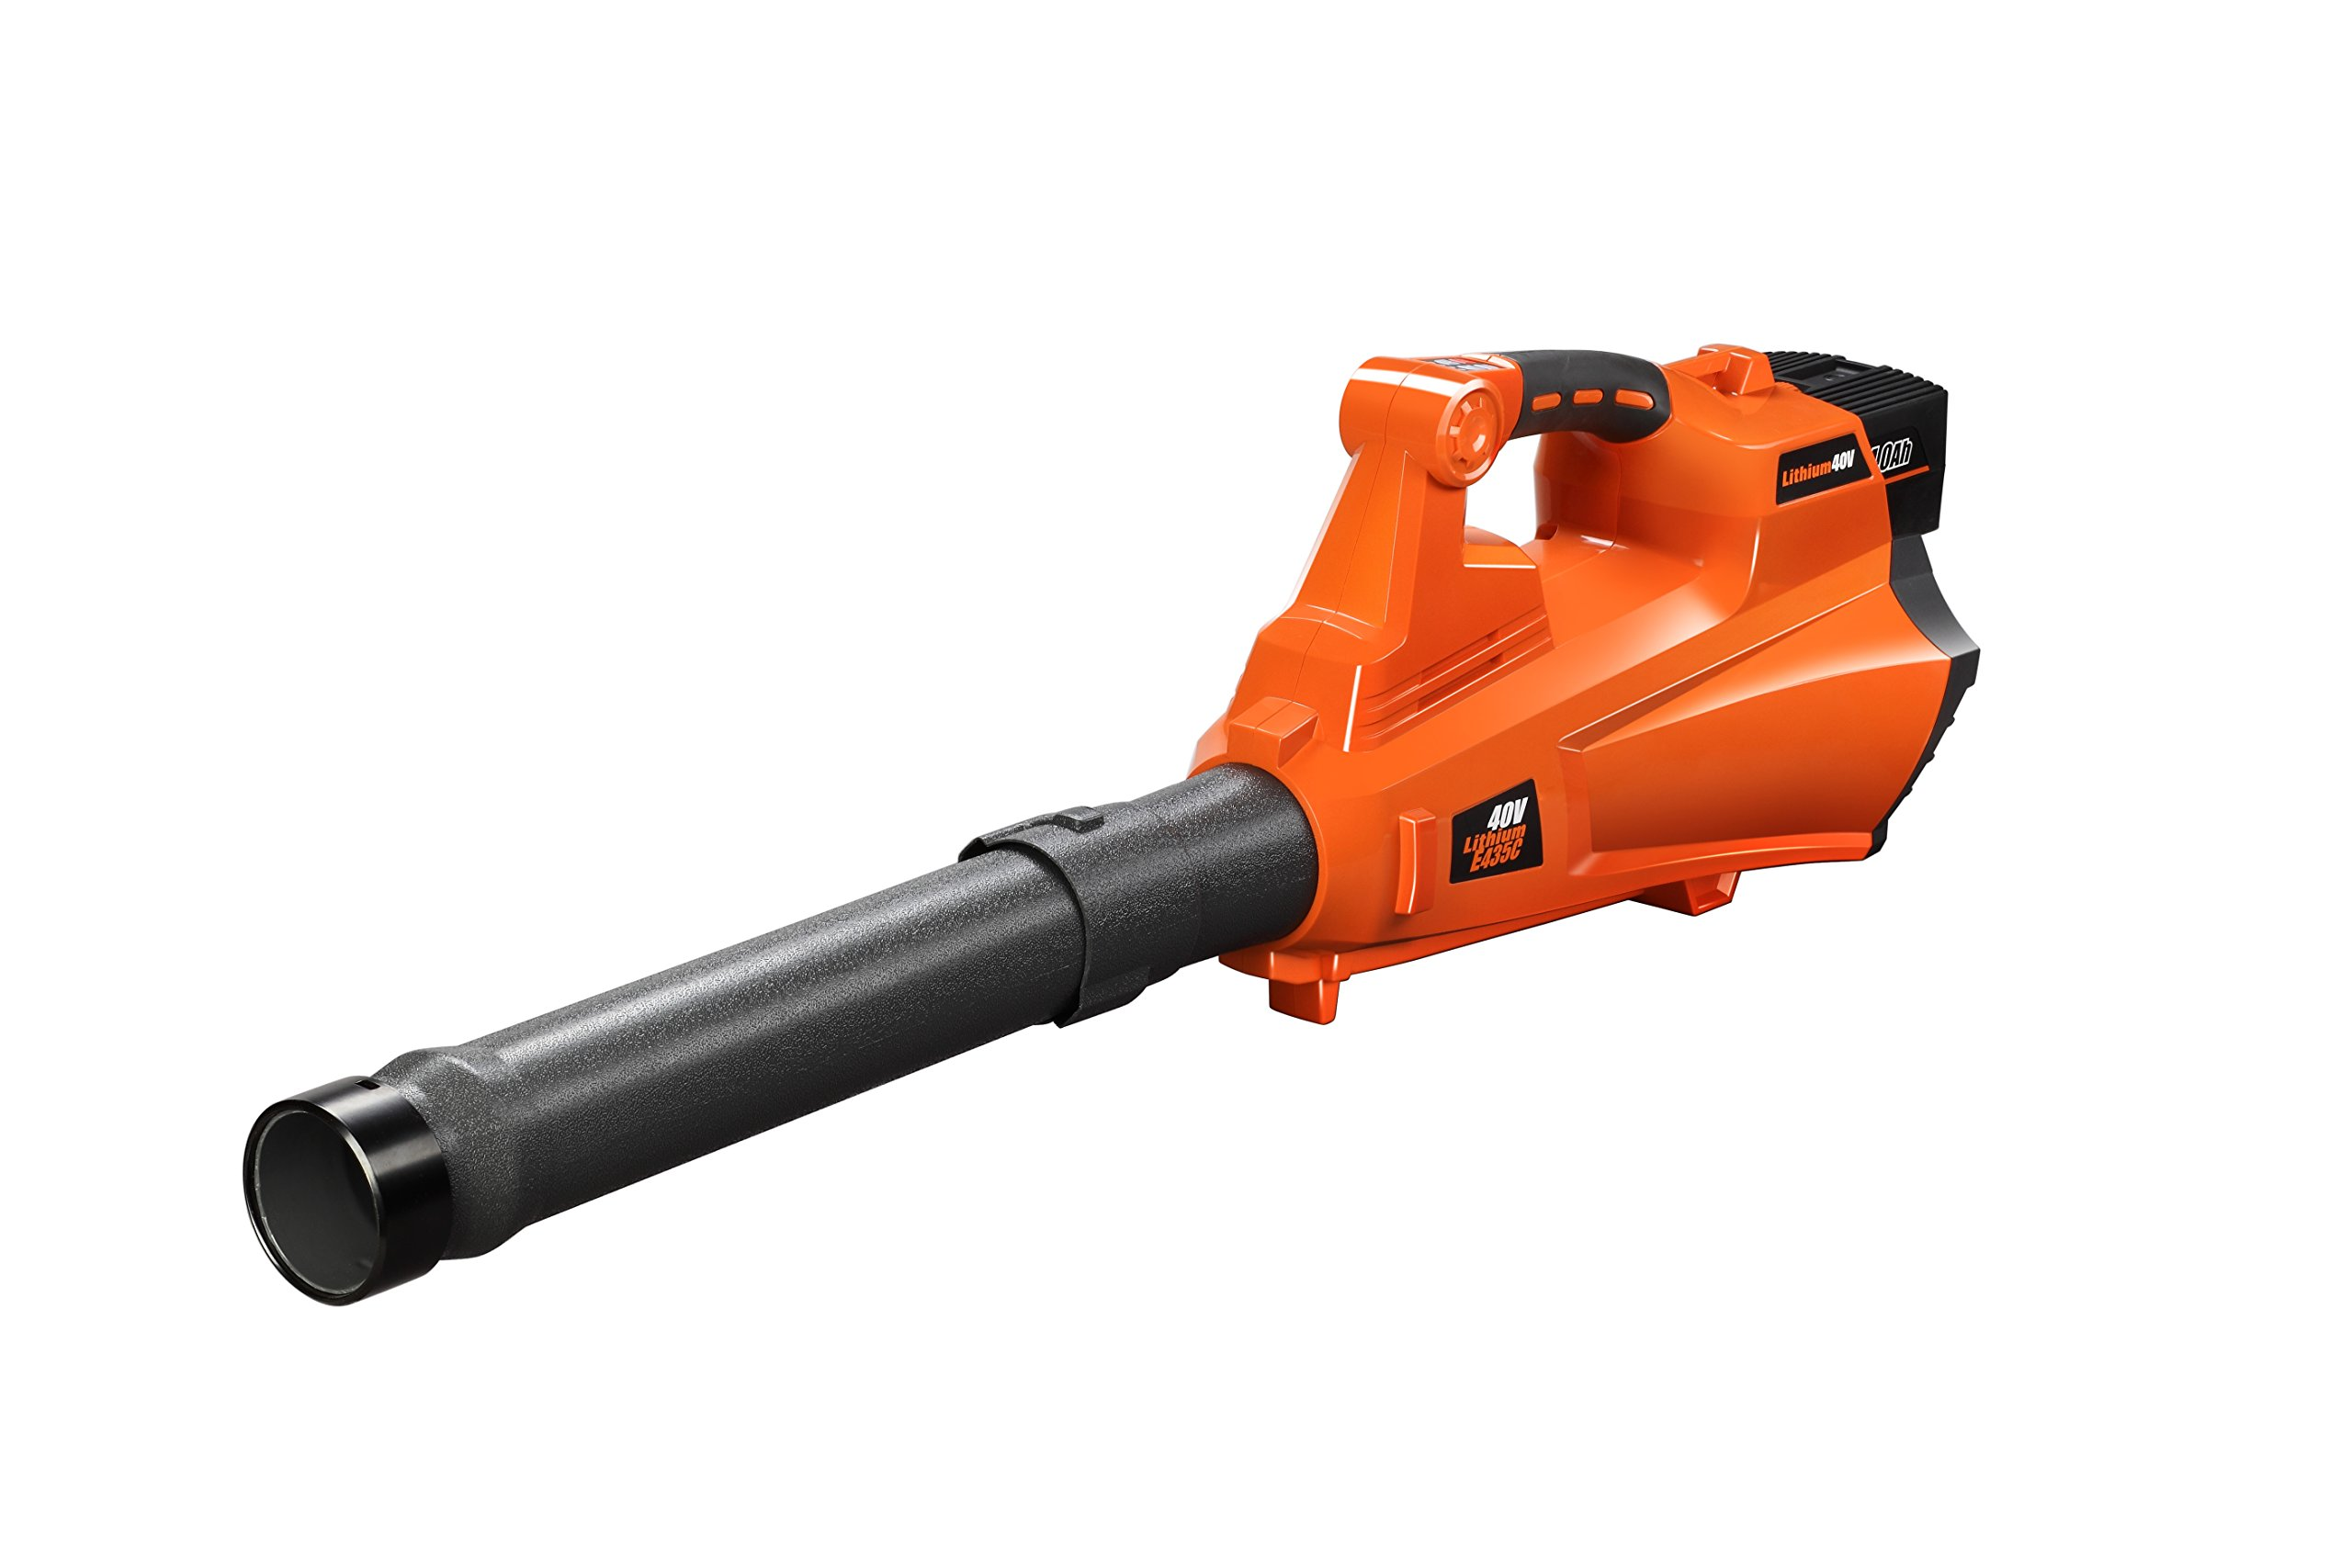 Redback 40V Cordless Li-ion Blower Kit